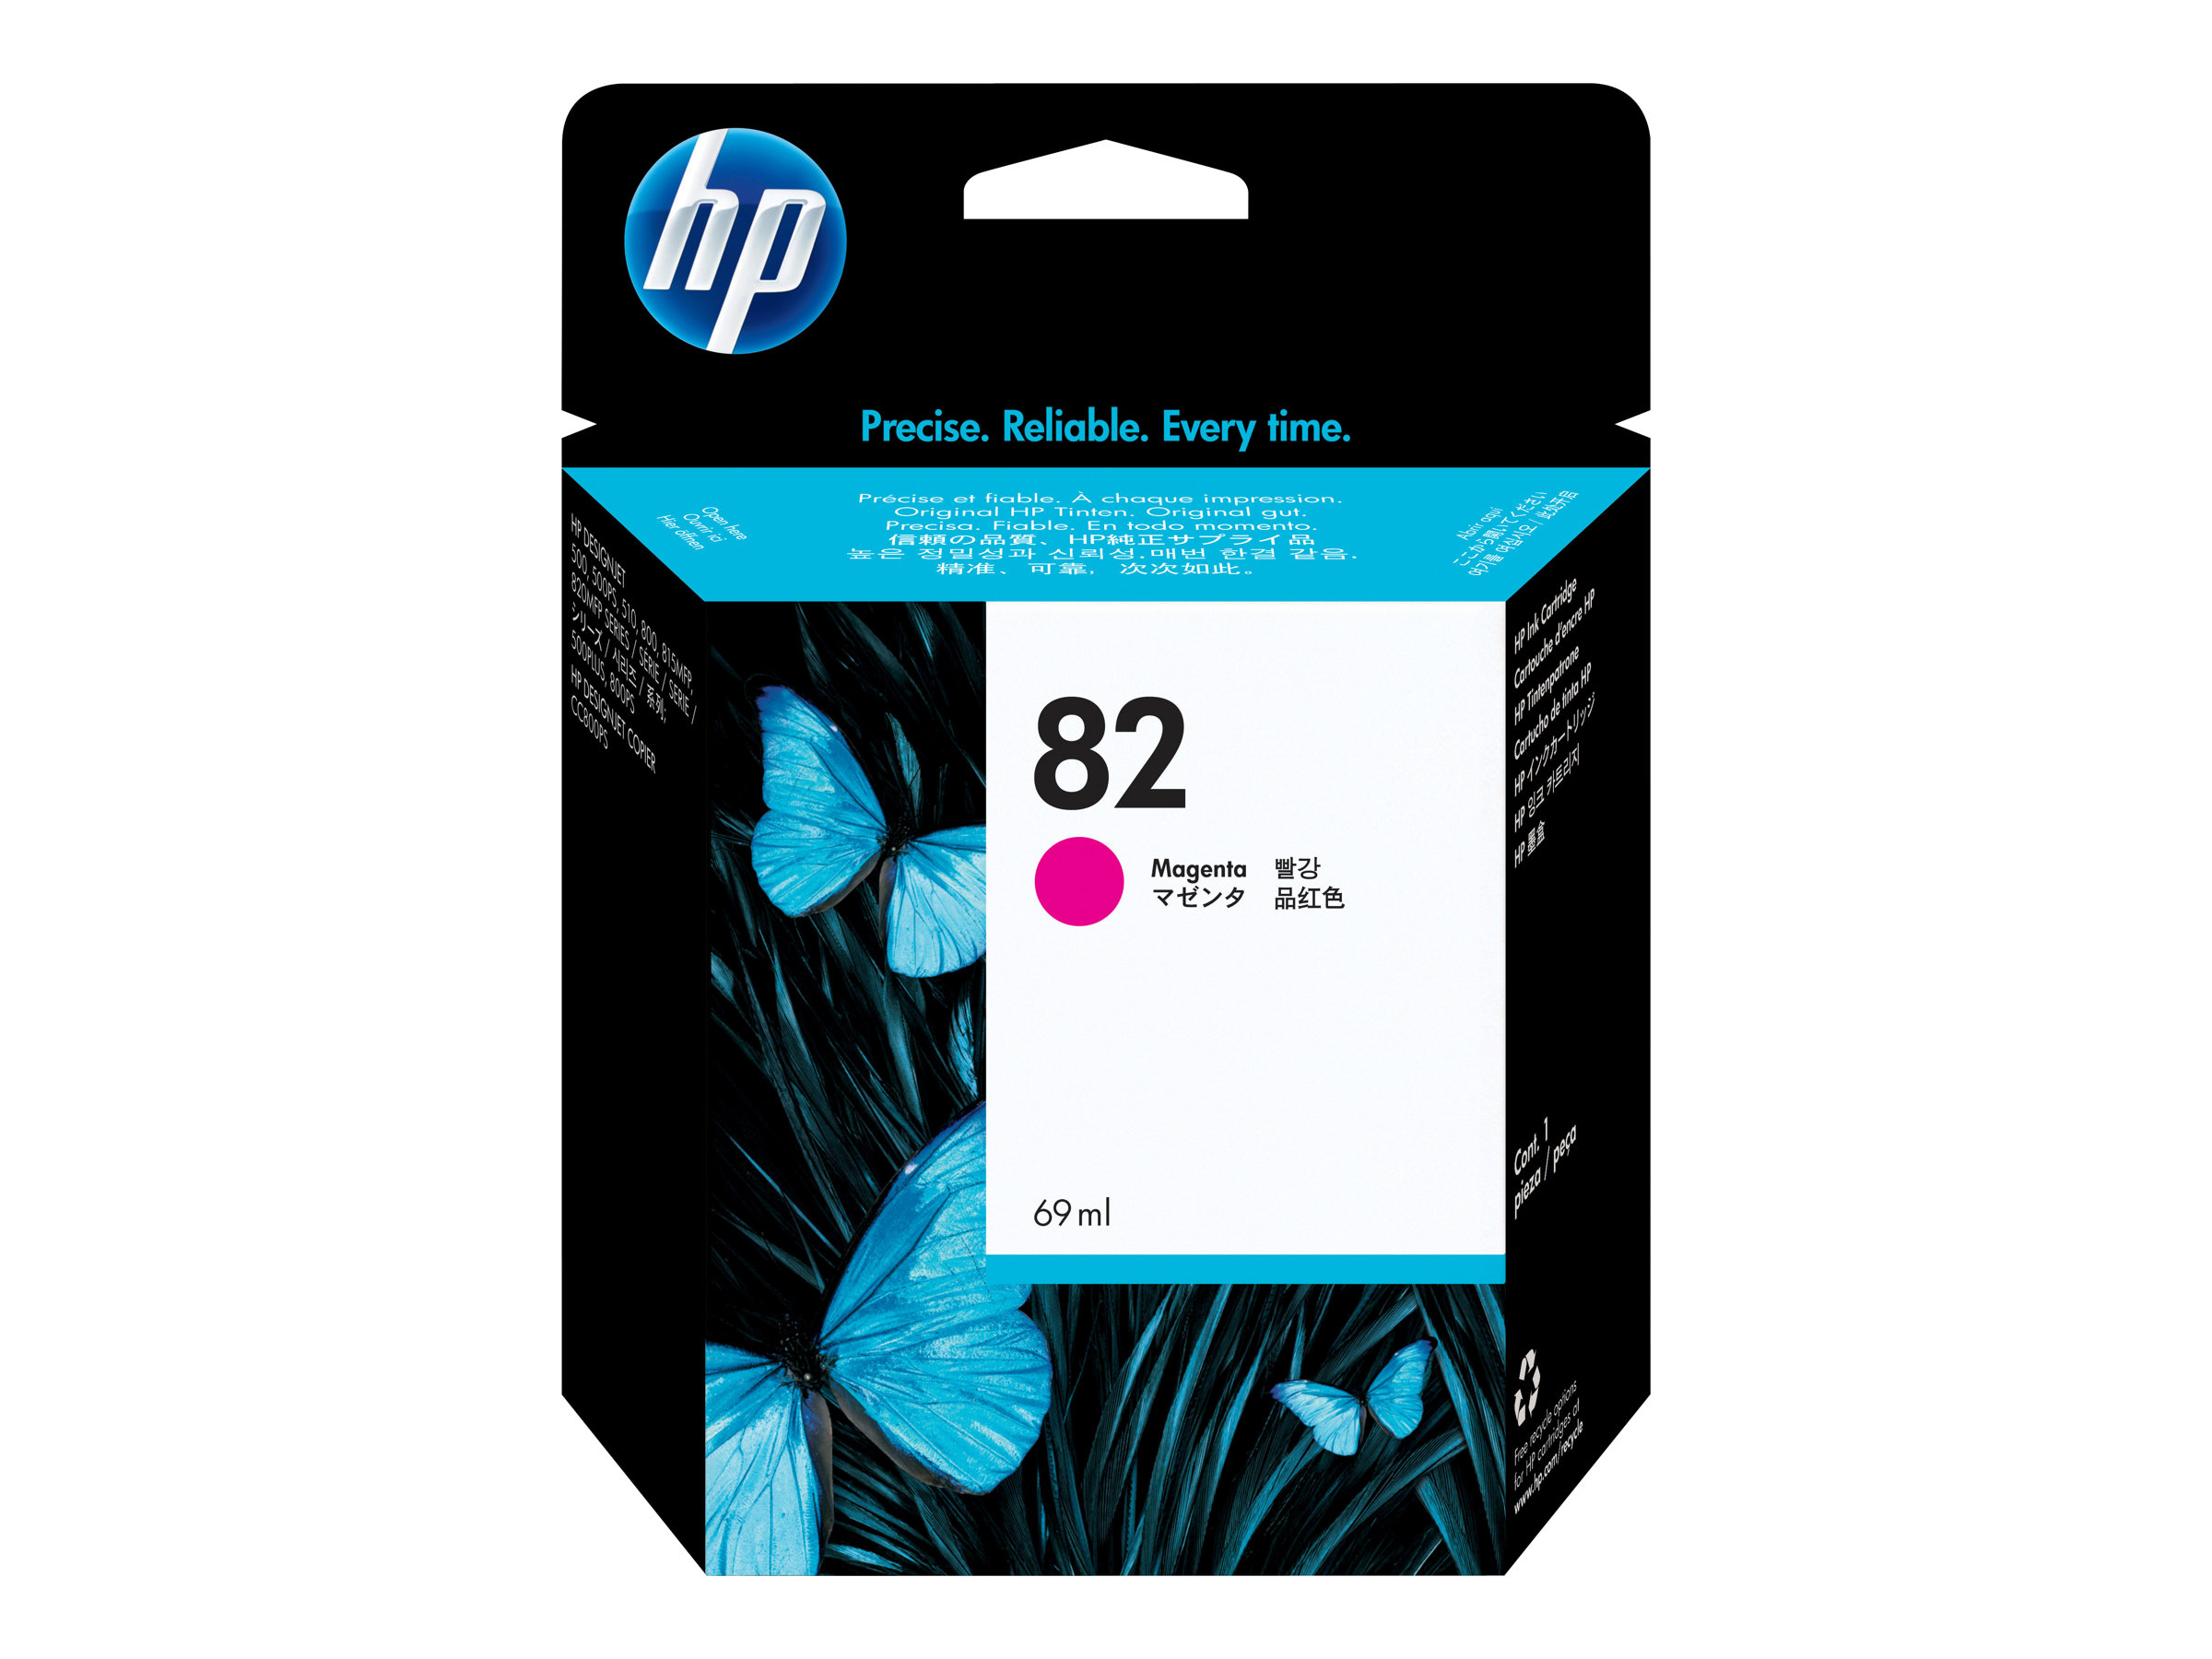 HP 82 - 69 ml - Dye-Based Magenta - Original - Tintenpatrone - für DesignJet 100, 120, 20, 500, 510, 800, 815, 820; Designjet Co